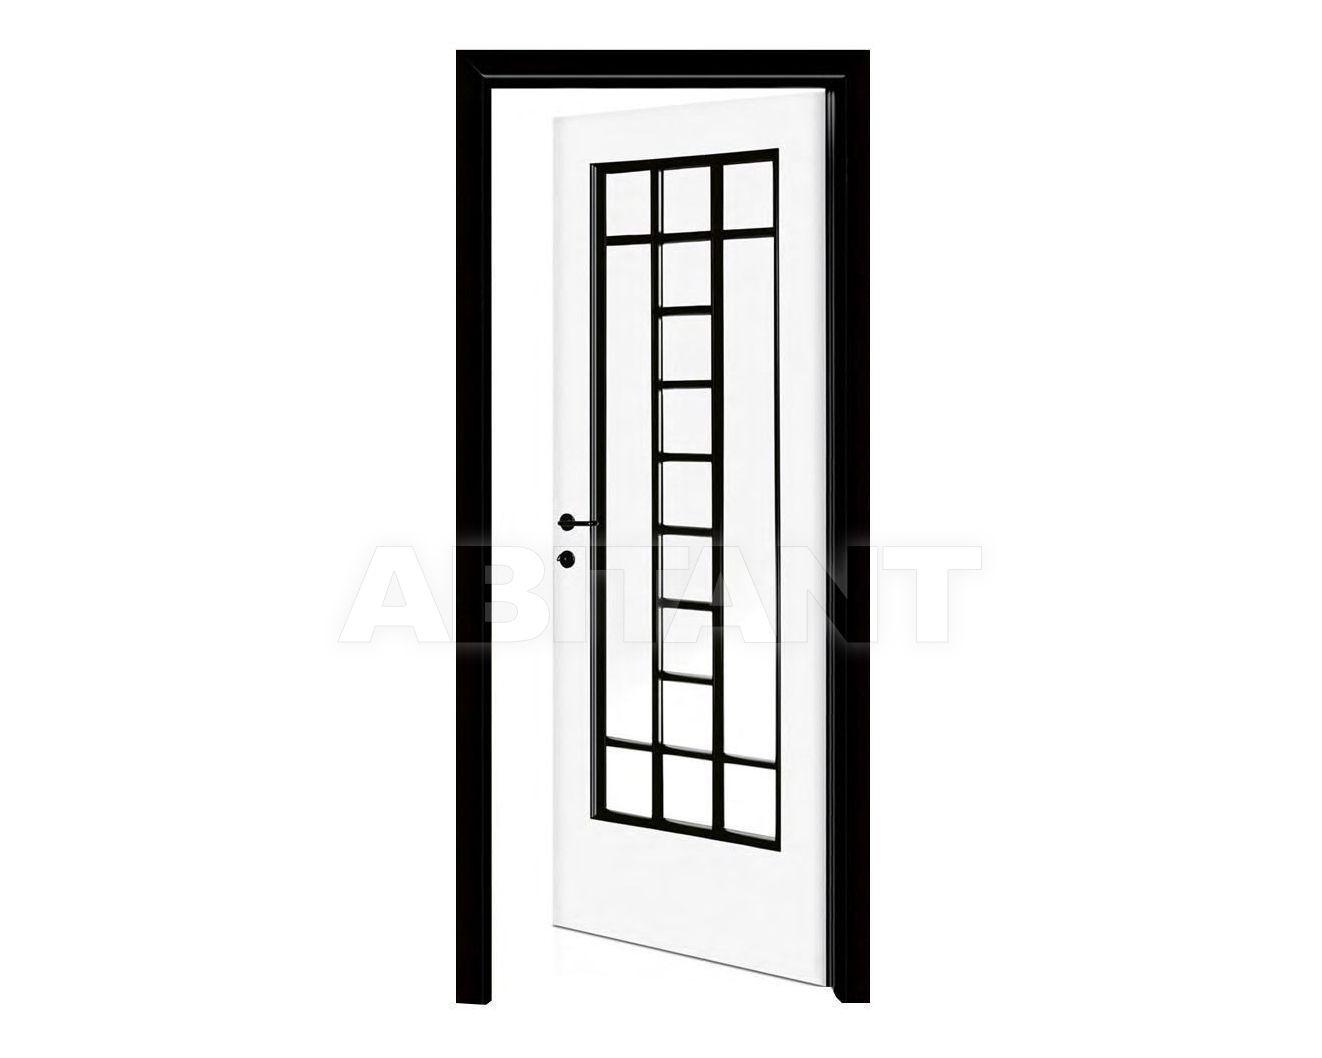 Купить Дверь деревянная Fioravazzi Classiche ARIANNA 4 INGLESE E